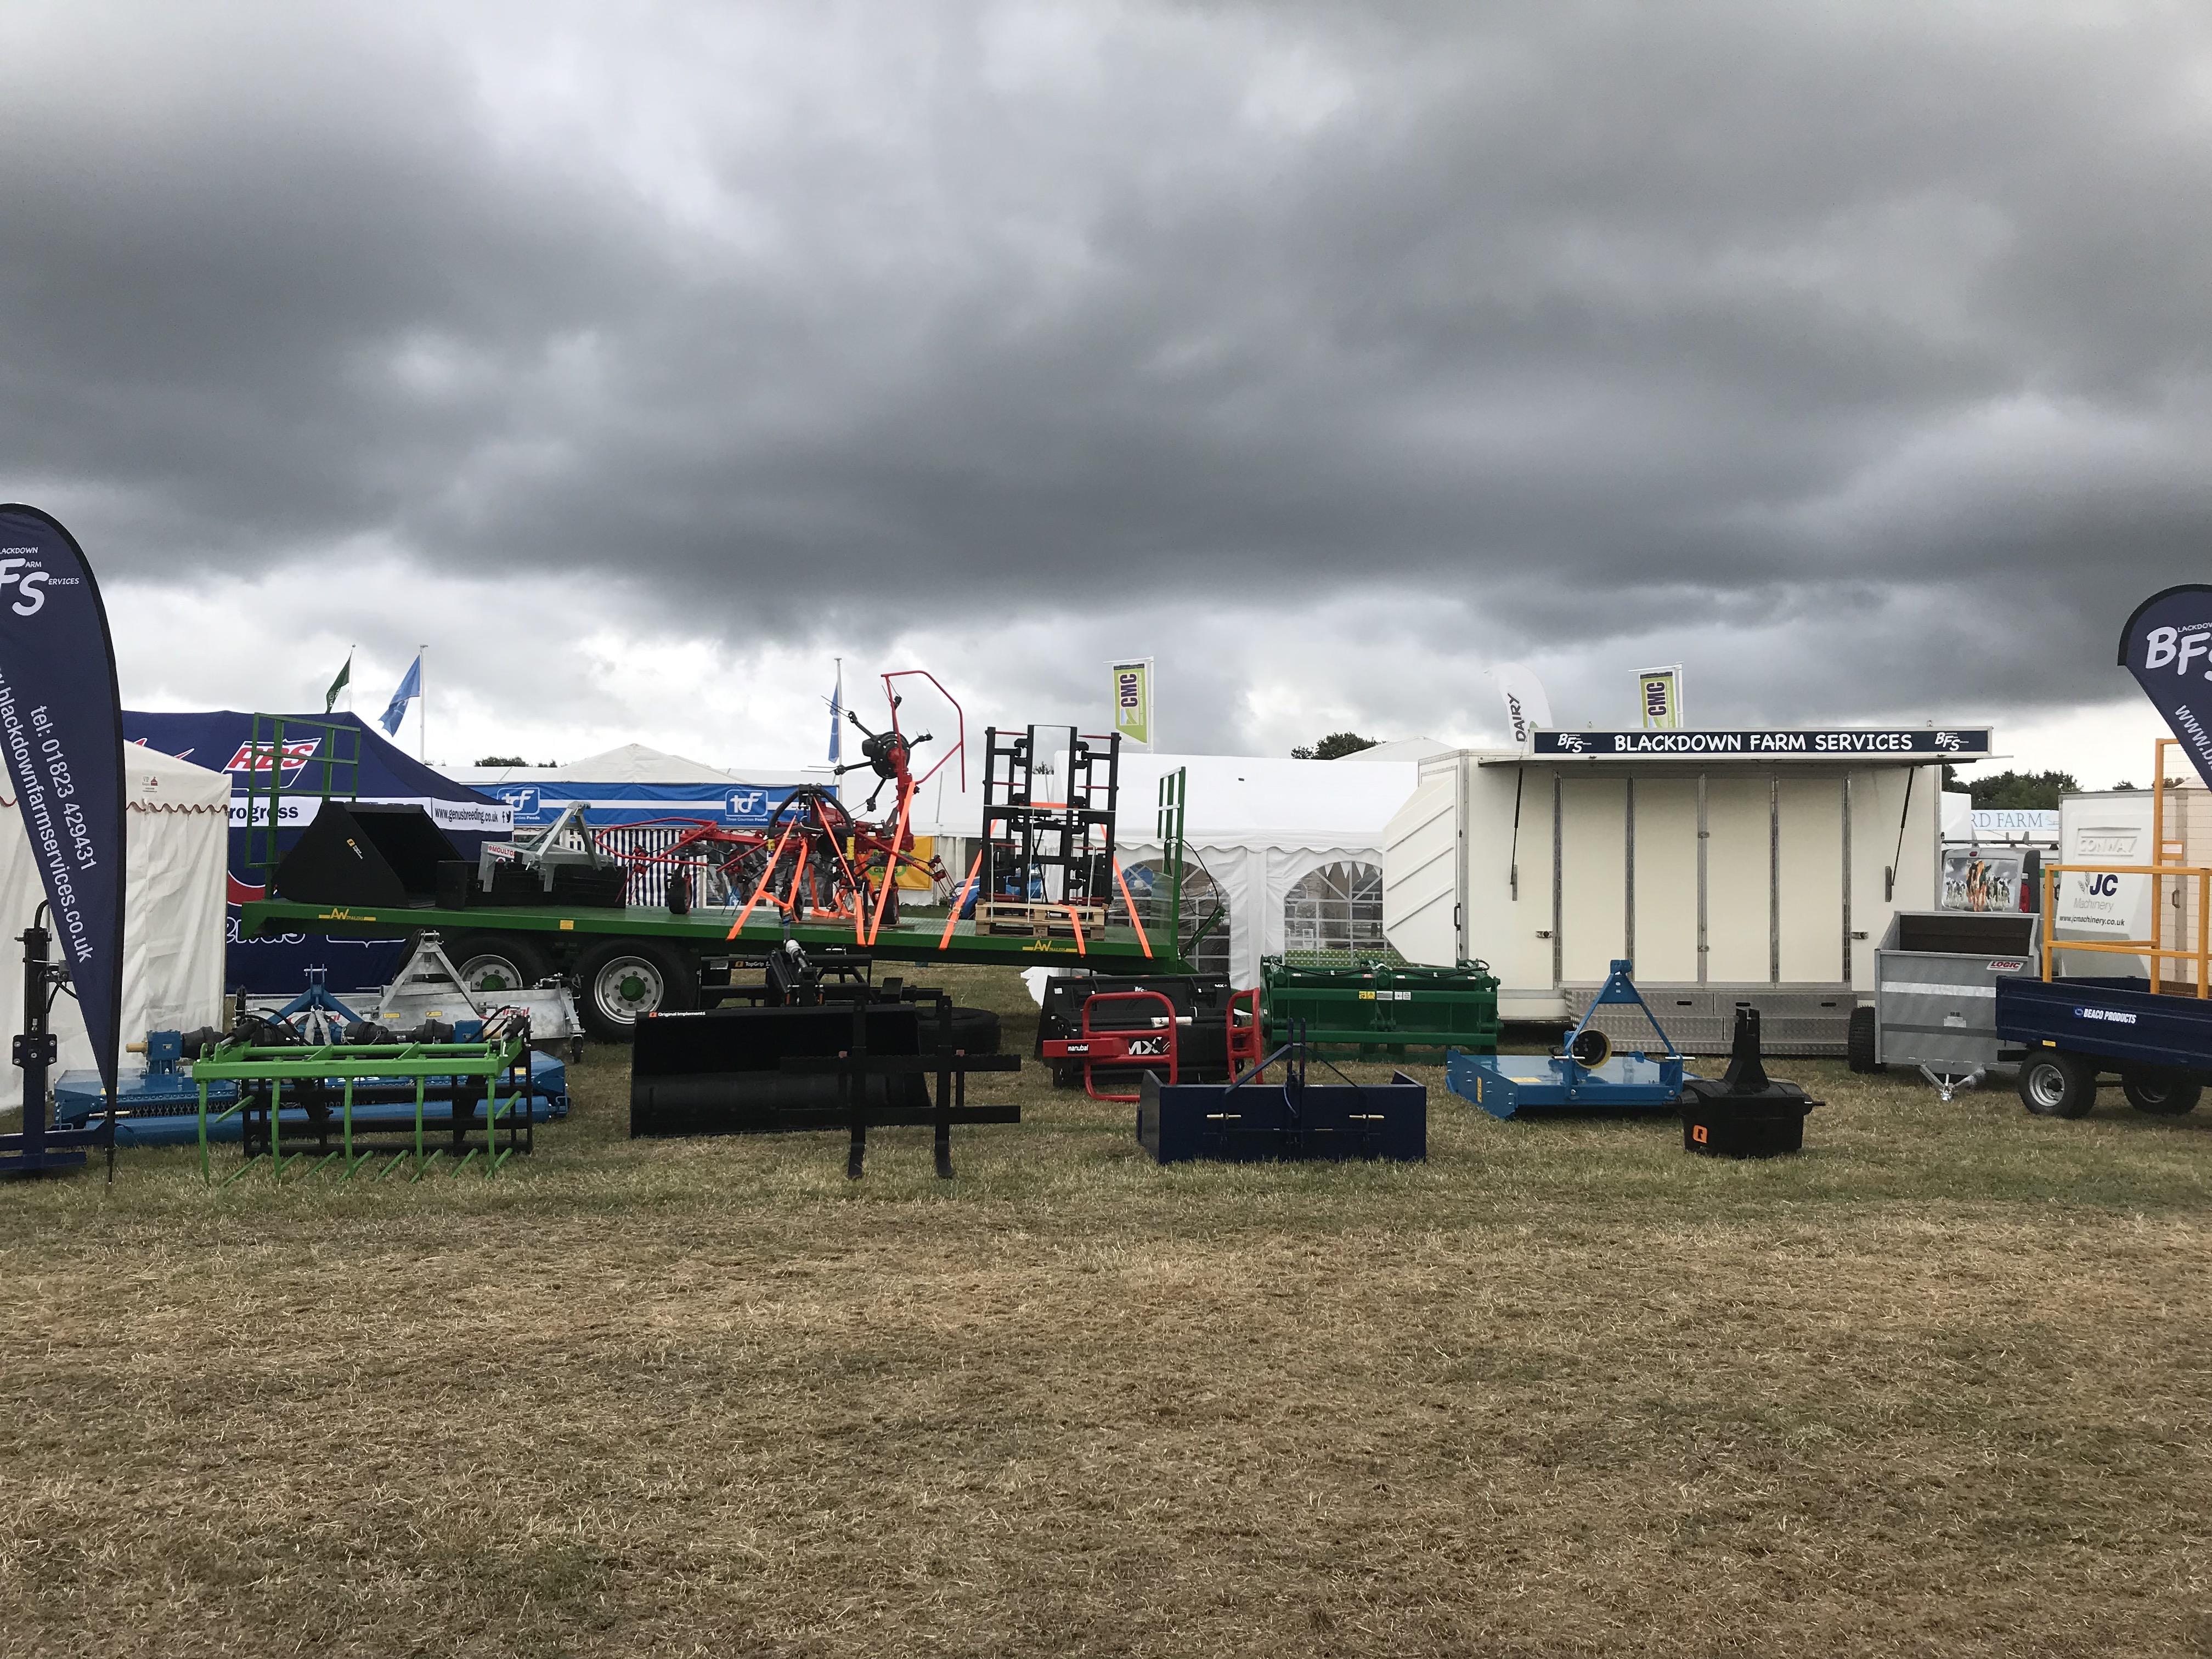 blackdwon farm services yard